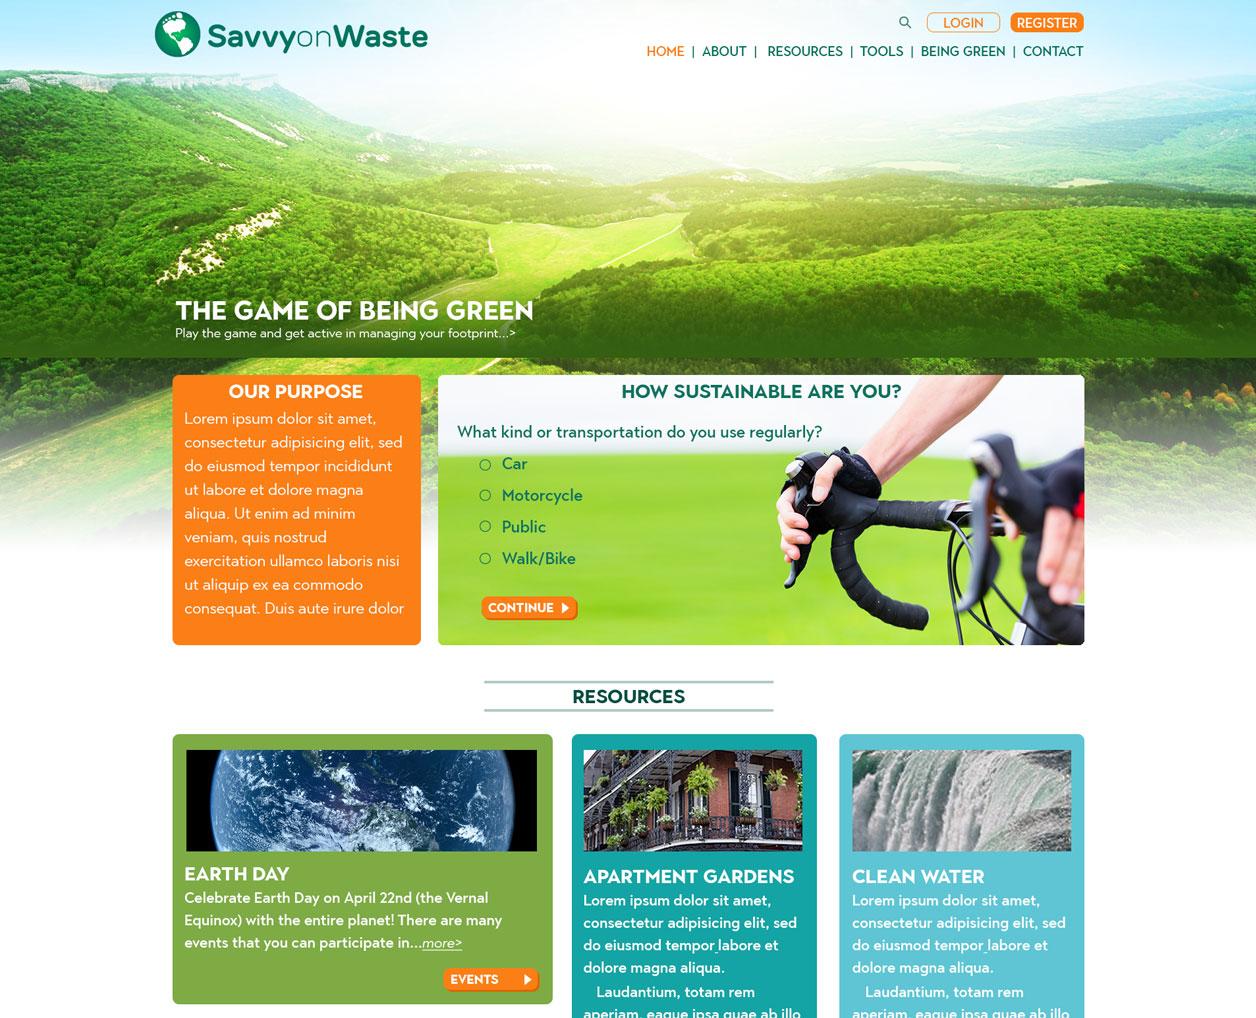 Savvy on Waste website design